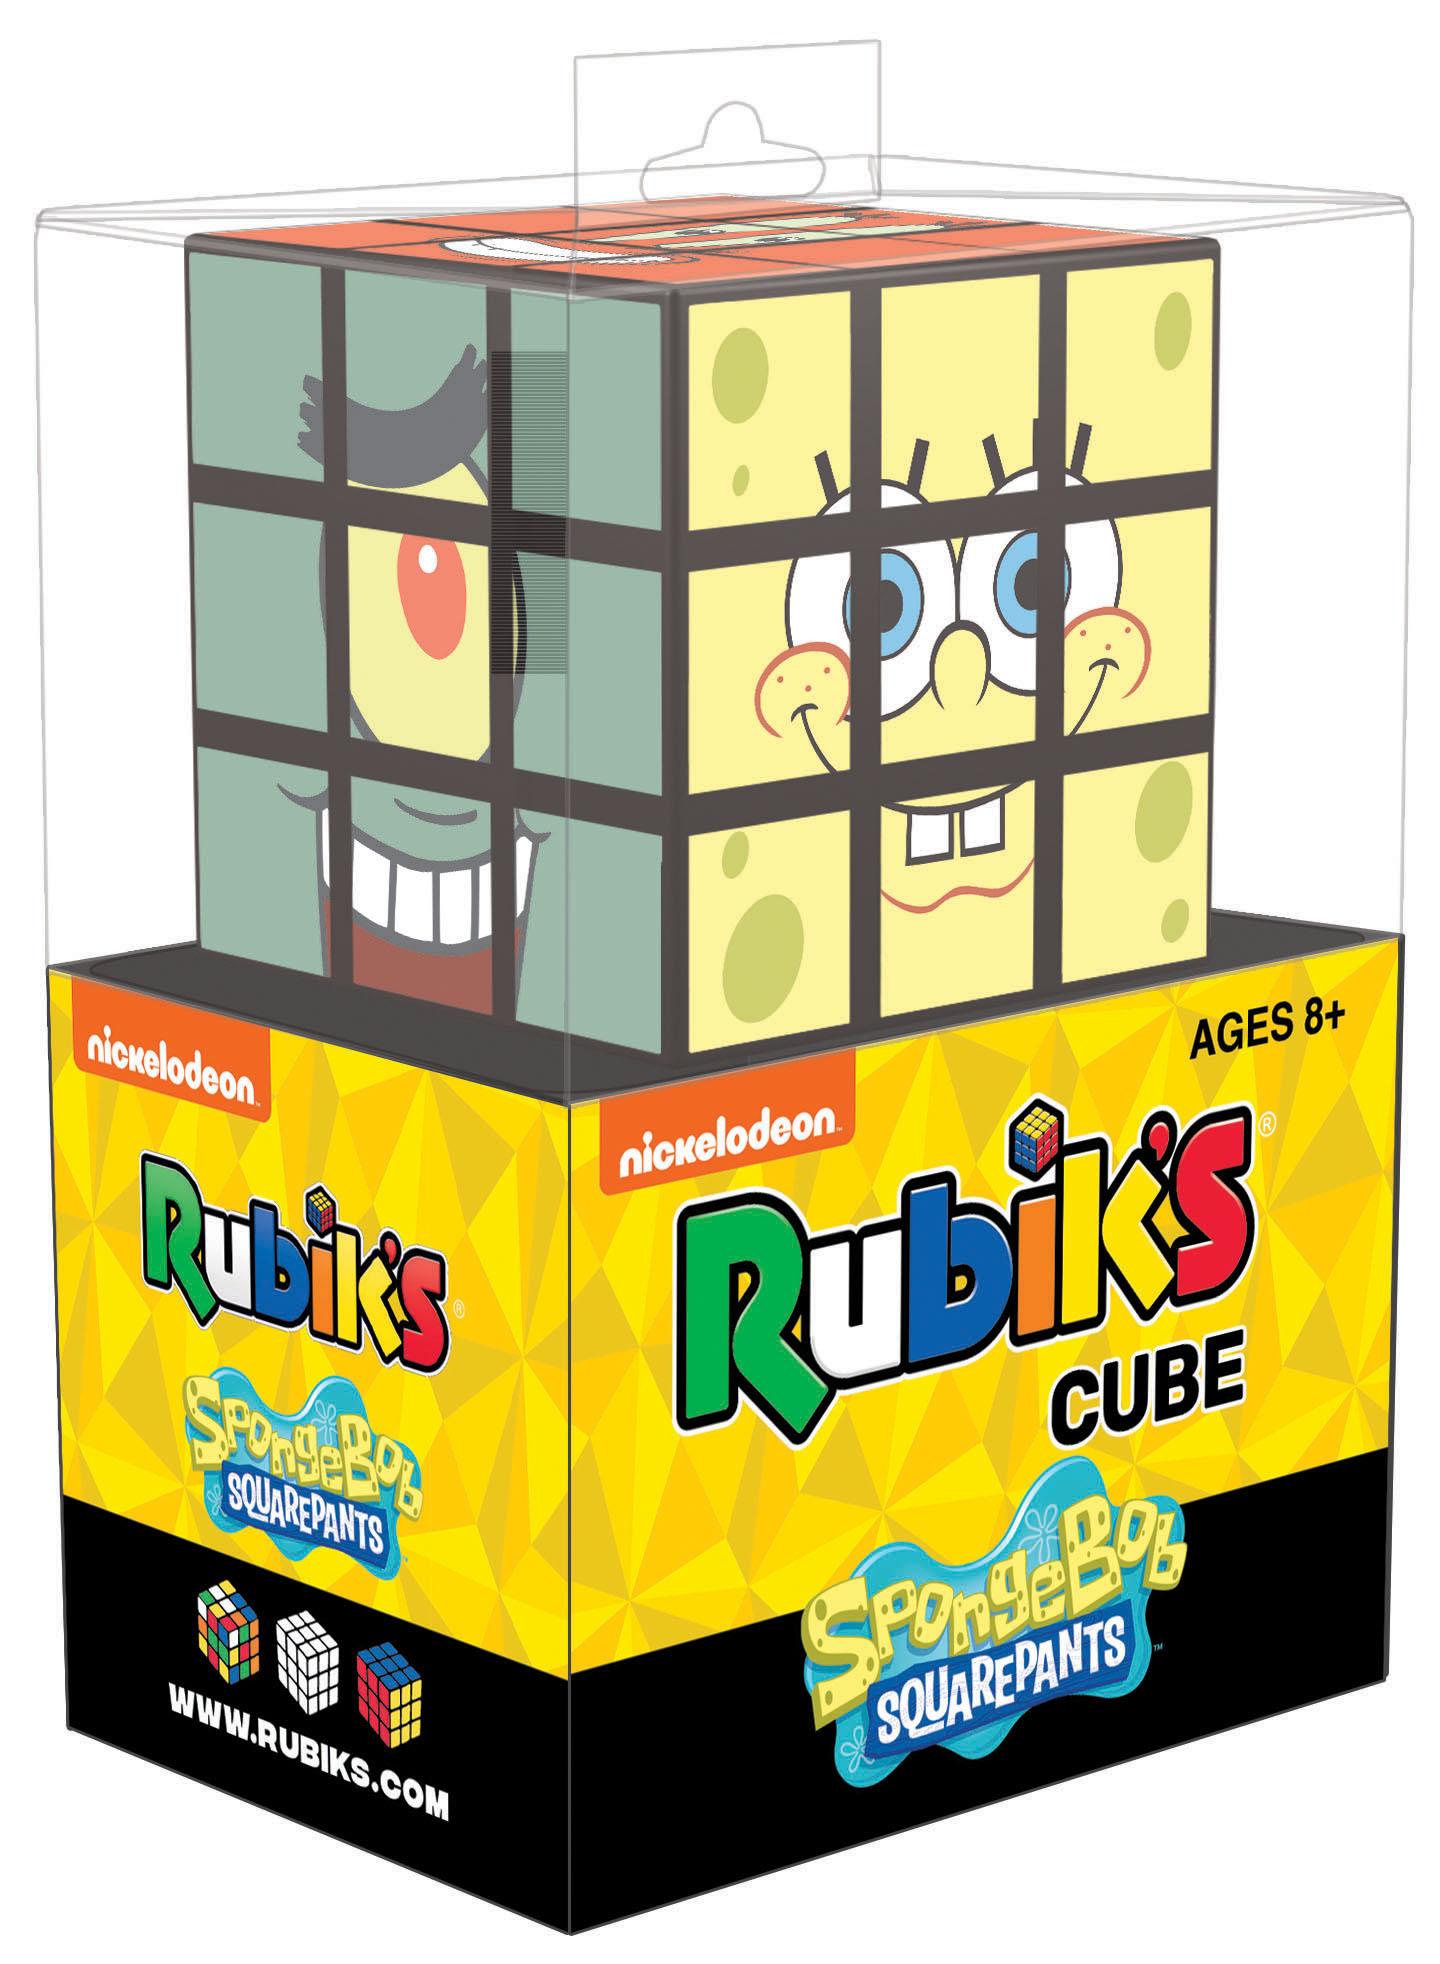 Rubiks Cube: Spongebob Squarepants